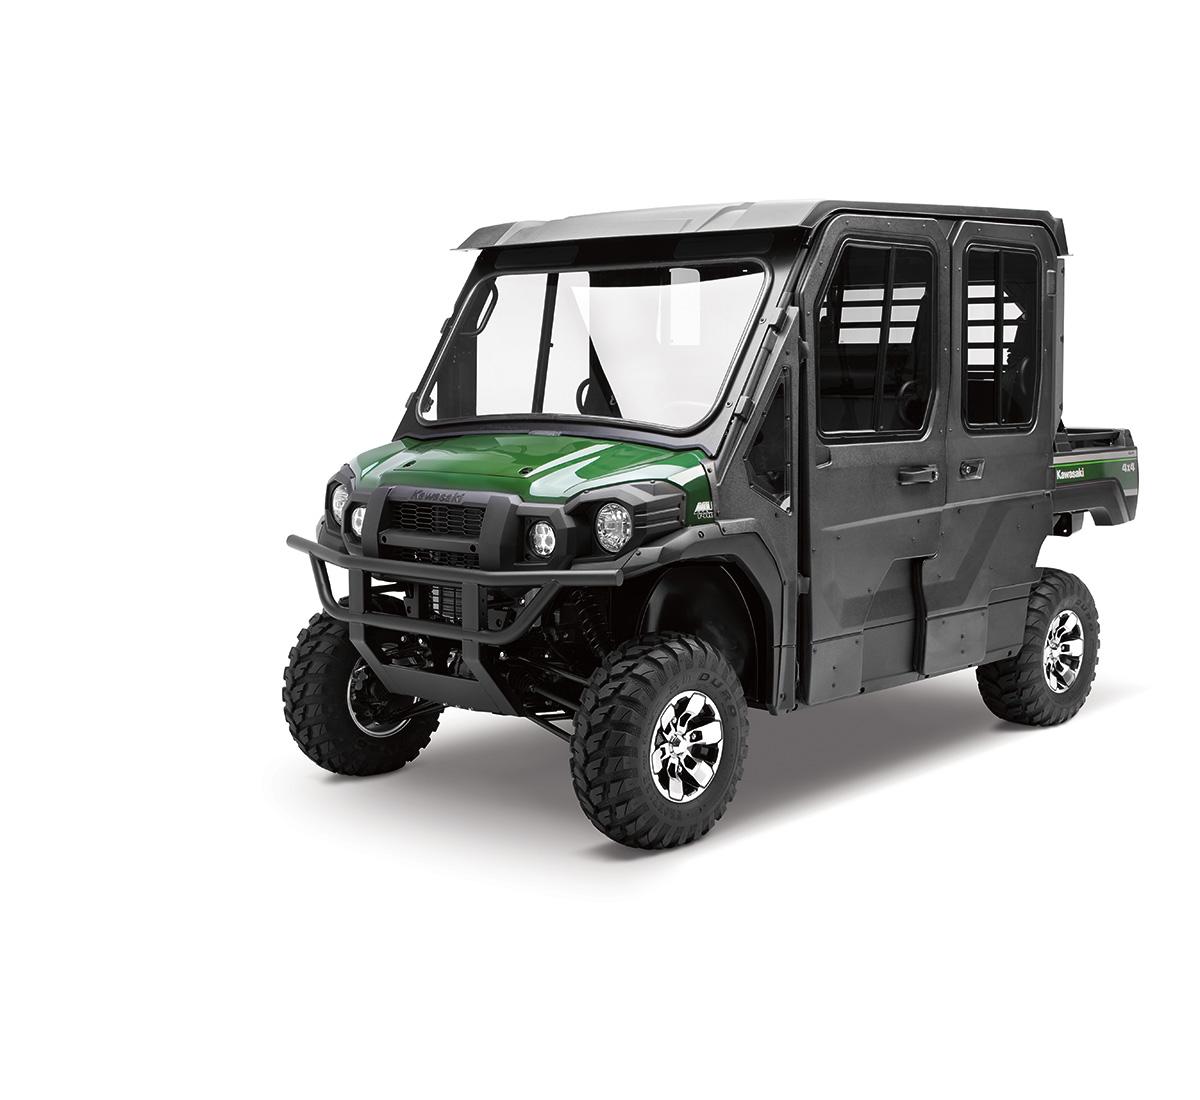 Kawasaki Mule Pro Fxt Rear Windshield